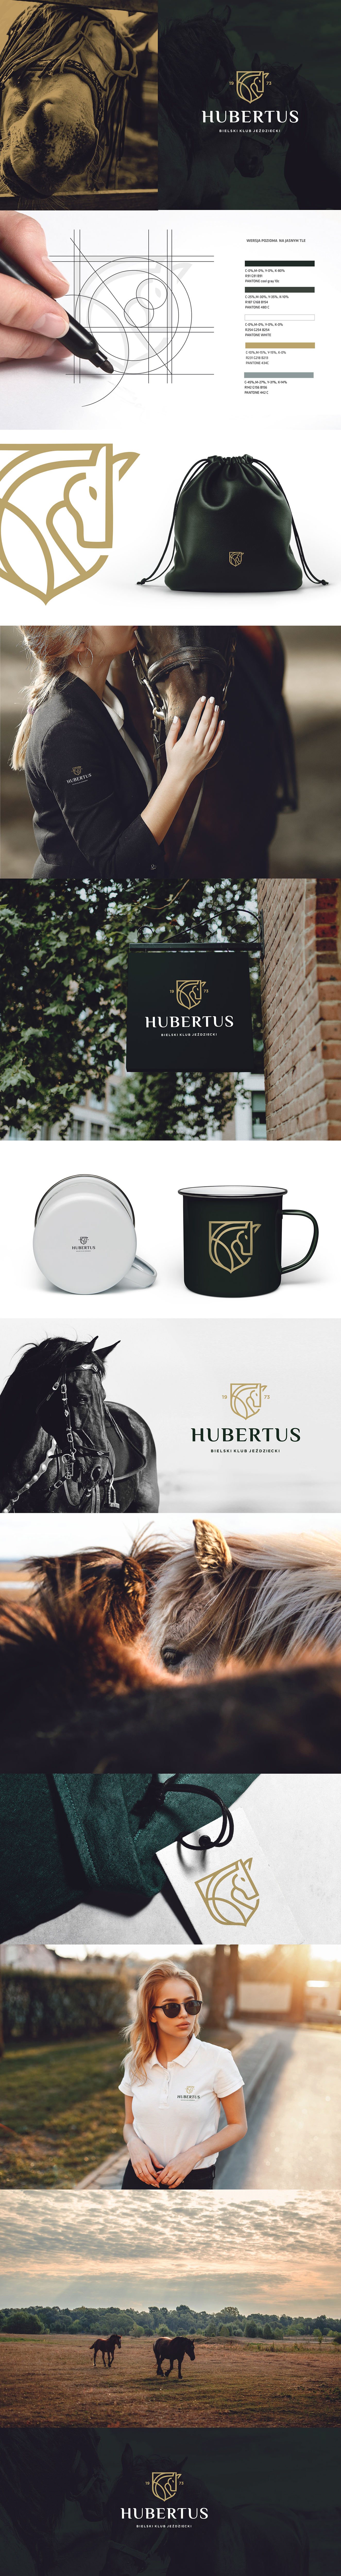 emblems,horse,horses,logo,stud